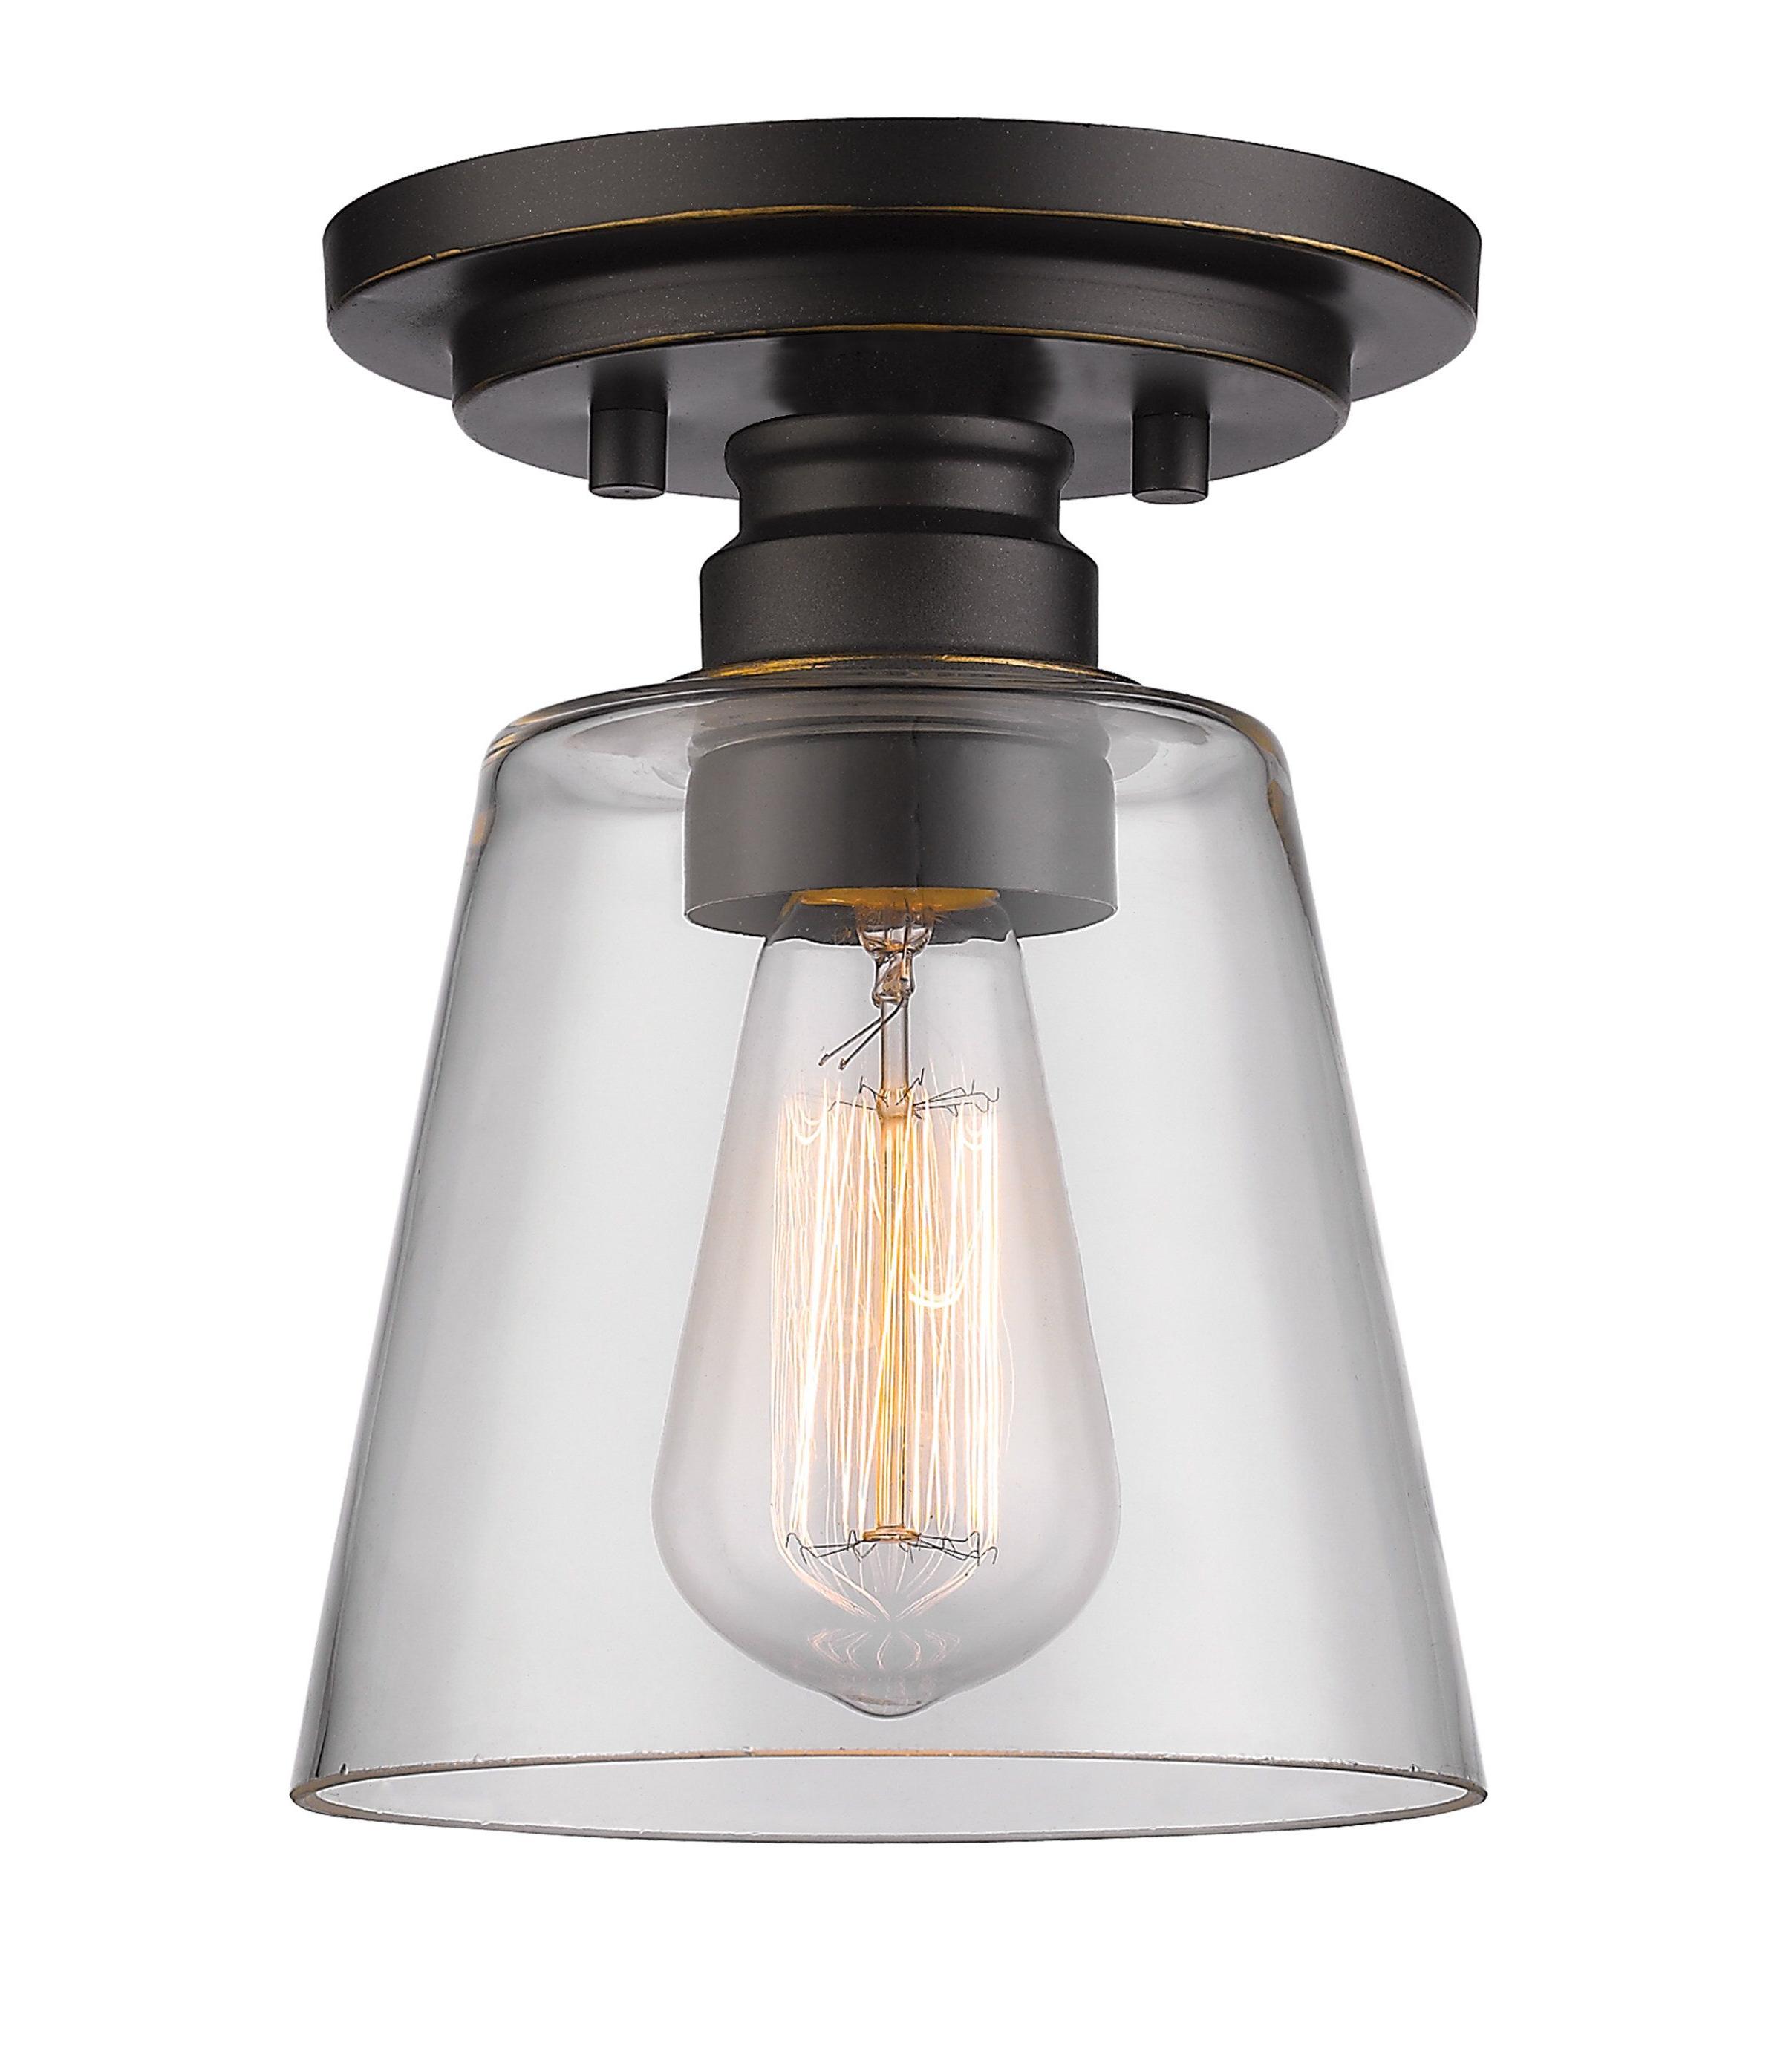 Trendy Erico 1 Light Single Bell Pendants Regarding Clayton 1 Light Semi Flush Mount (View 20 of 20)